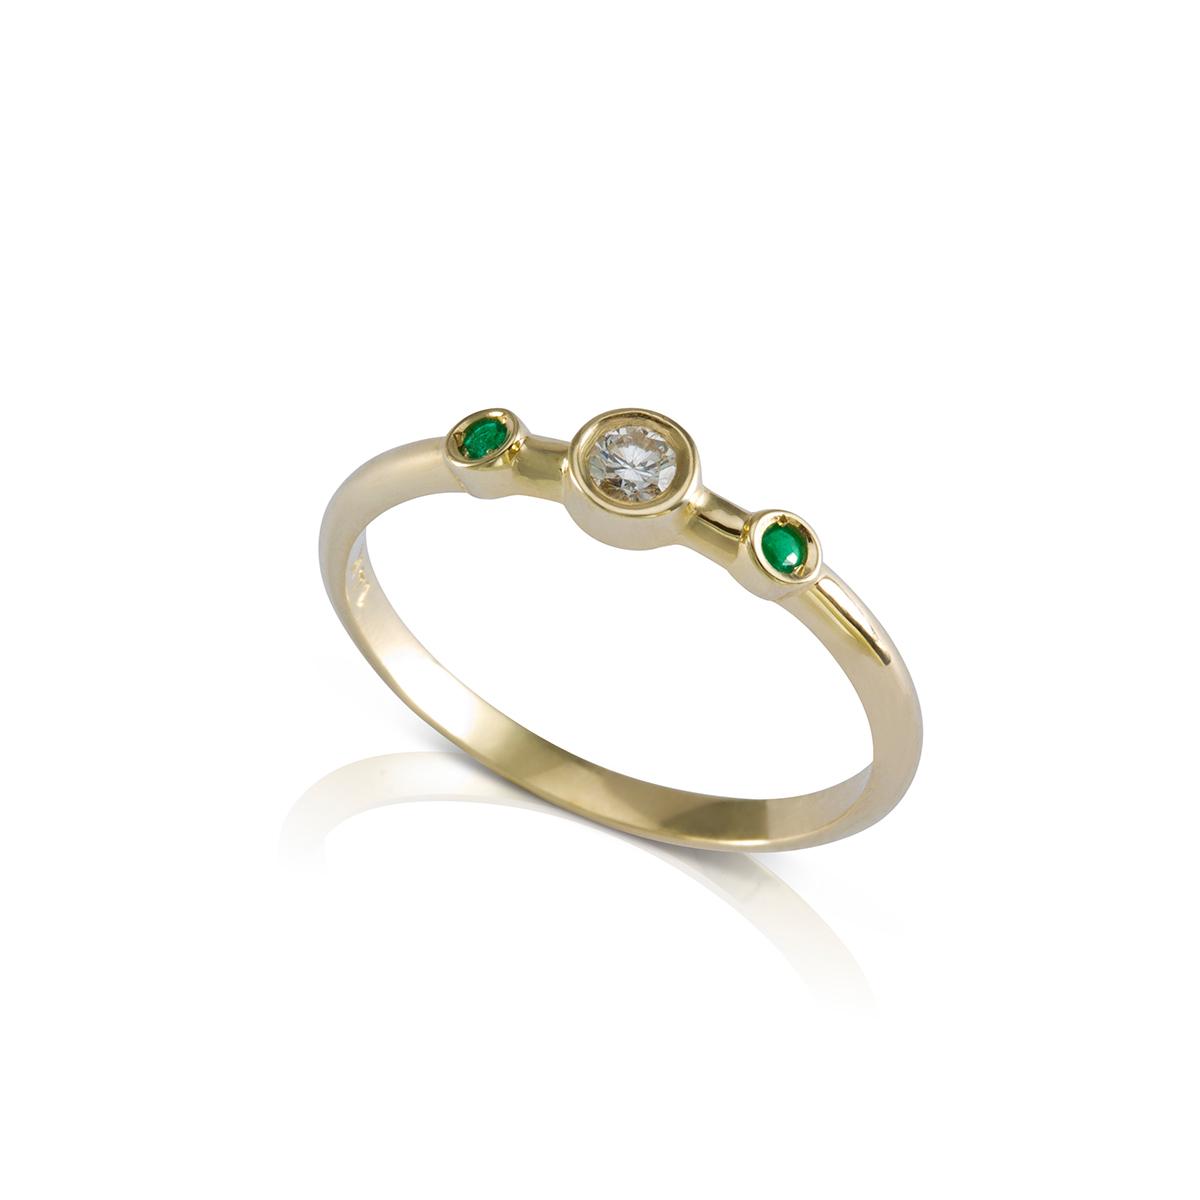 A delicate diamond and emerald ring